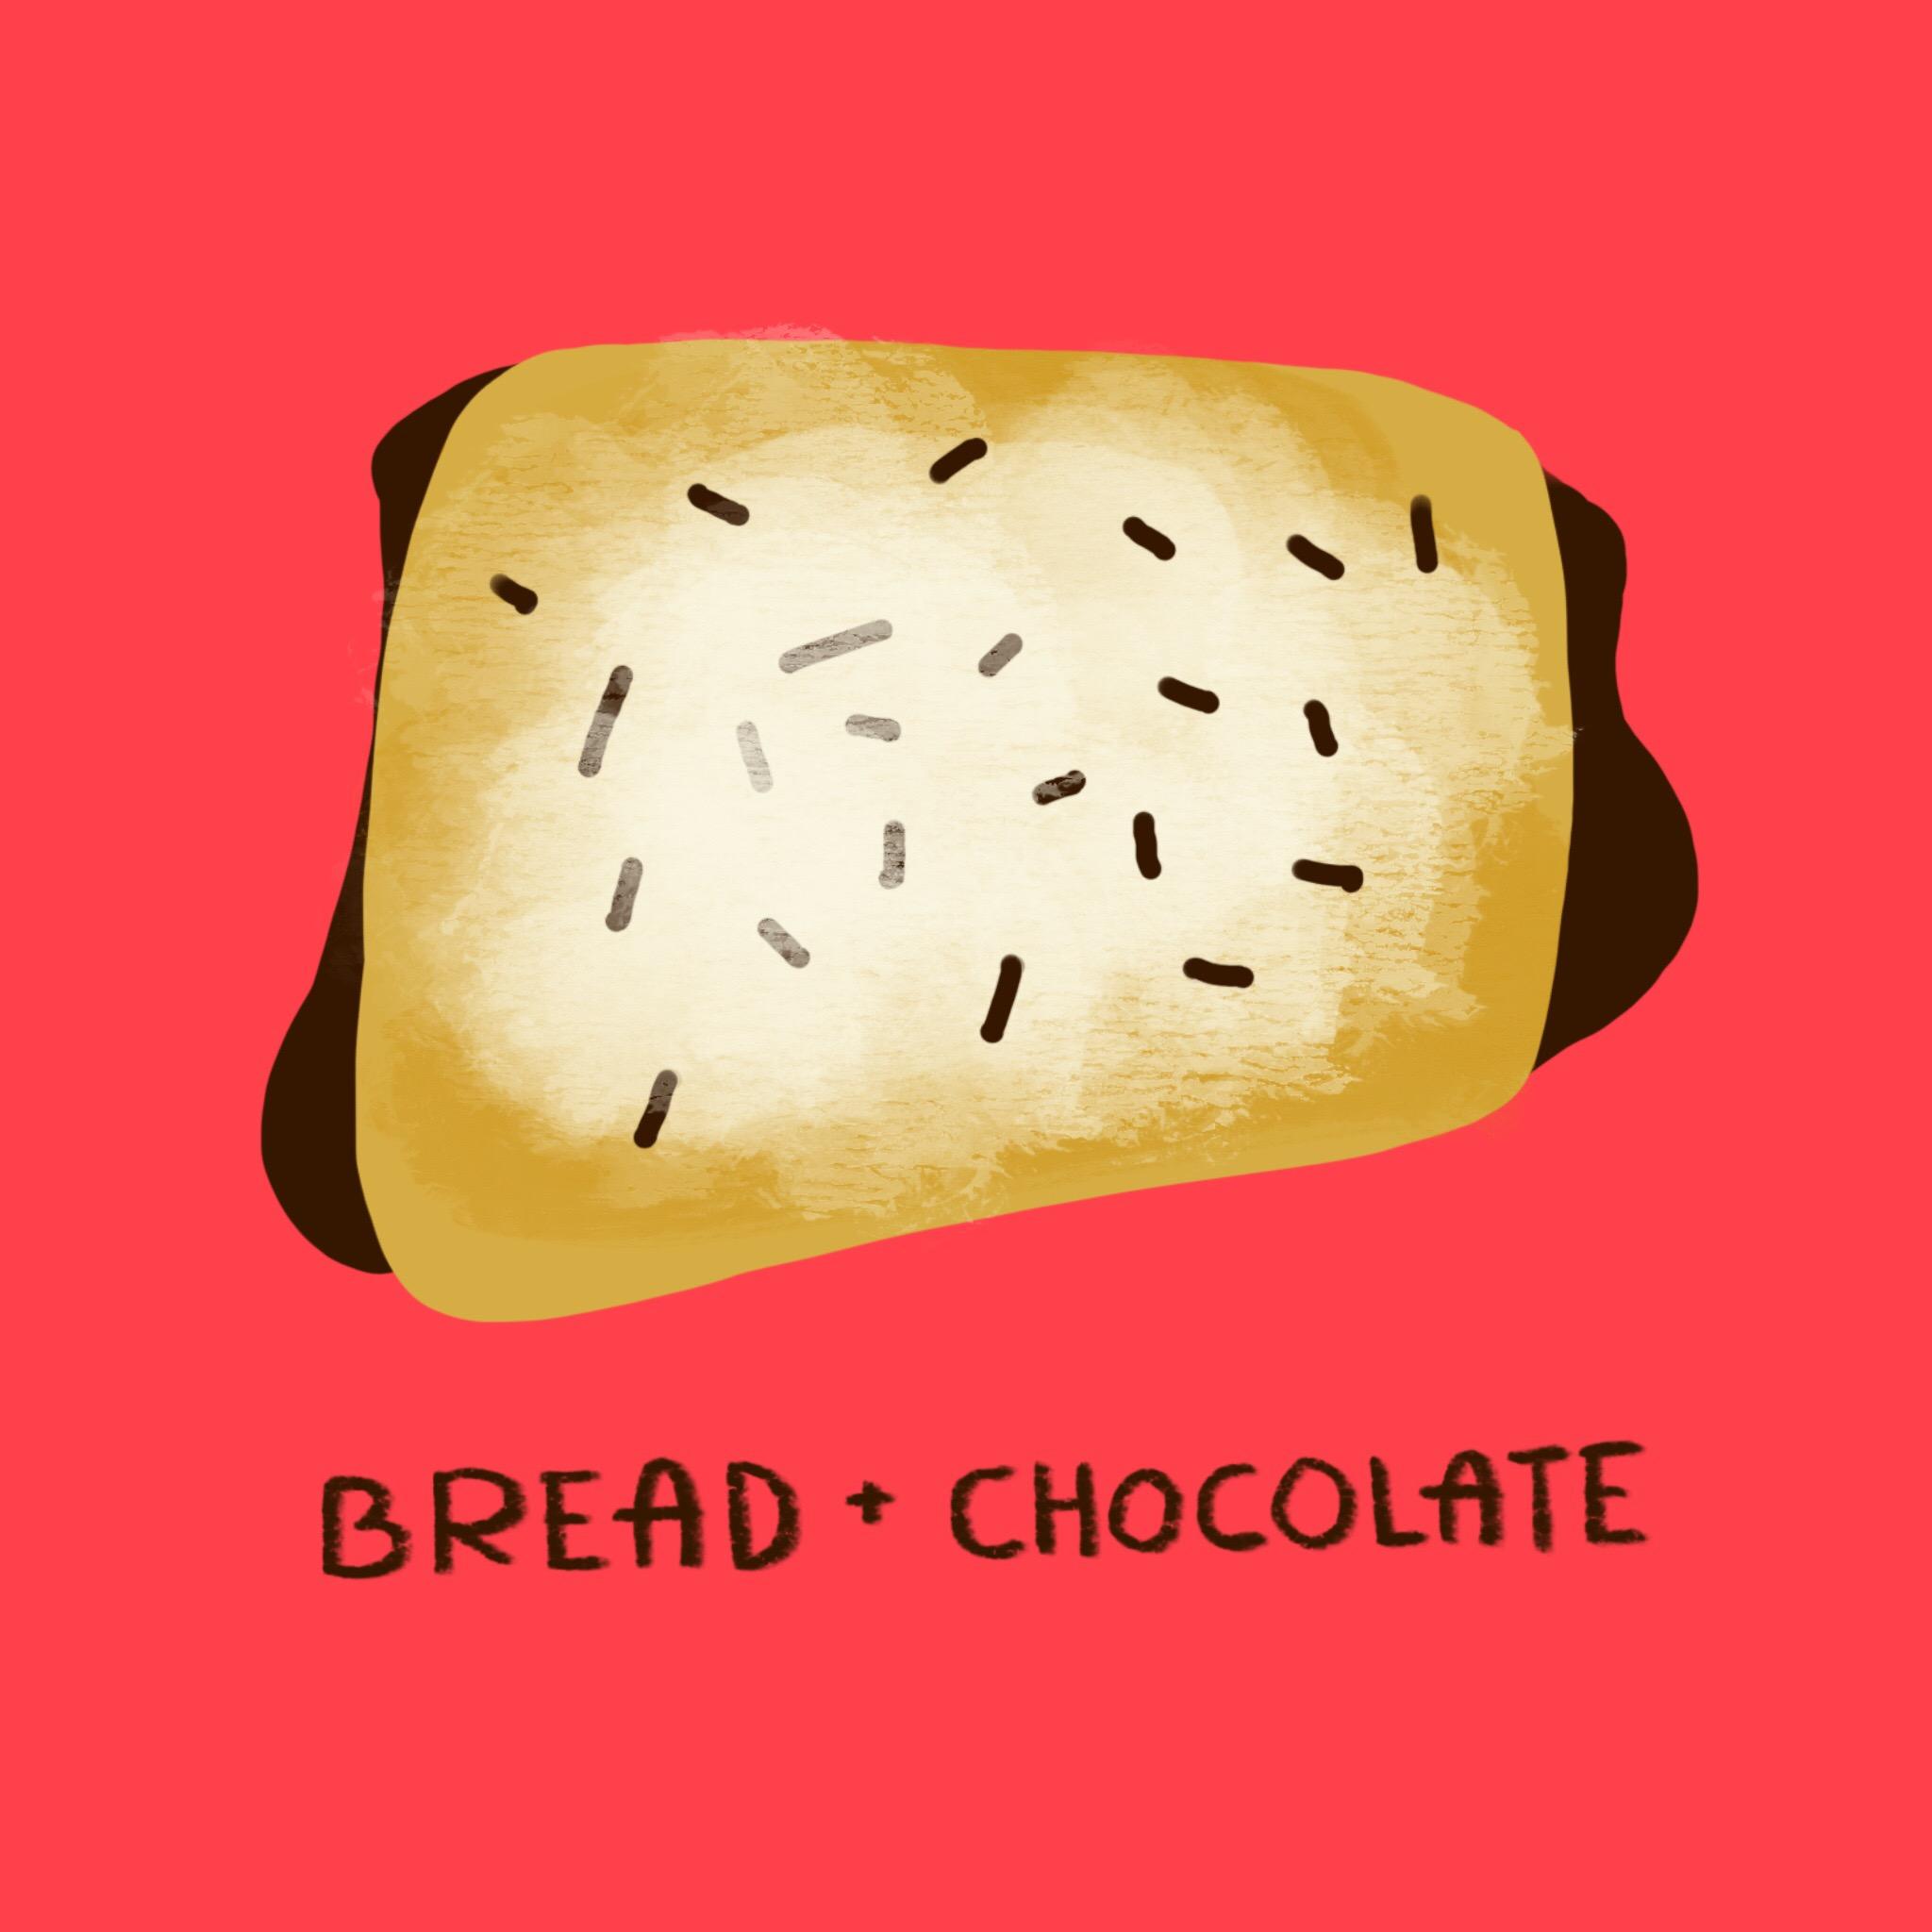 71_-_Bread_+_Chocolate.jpg